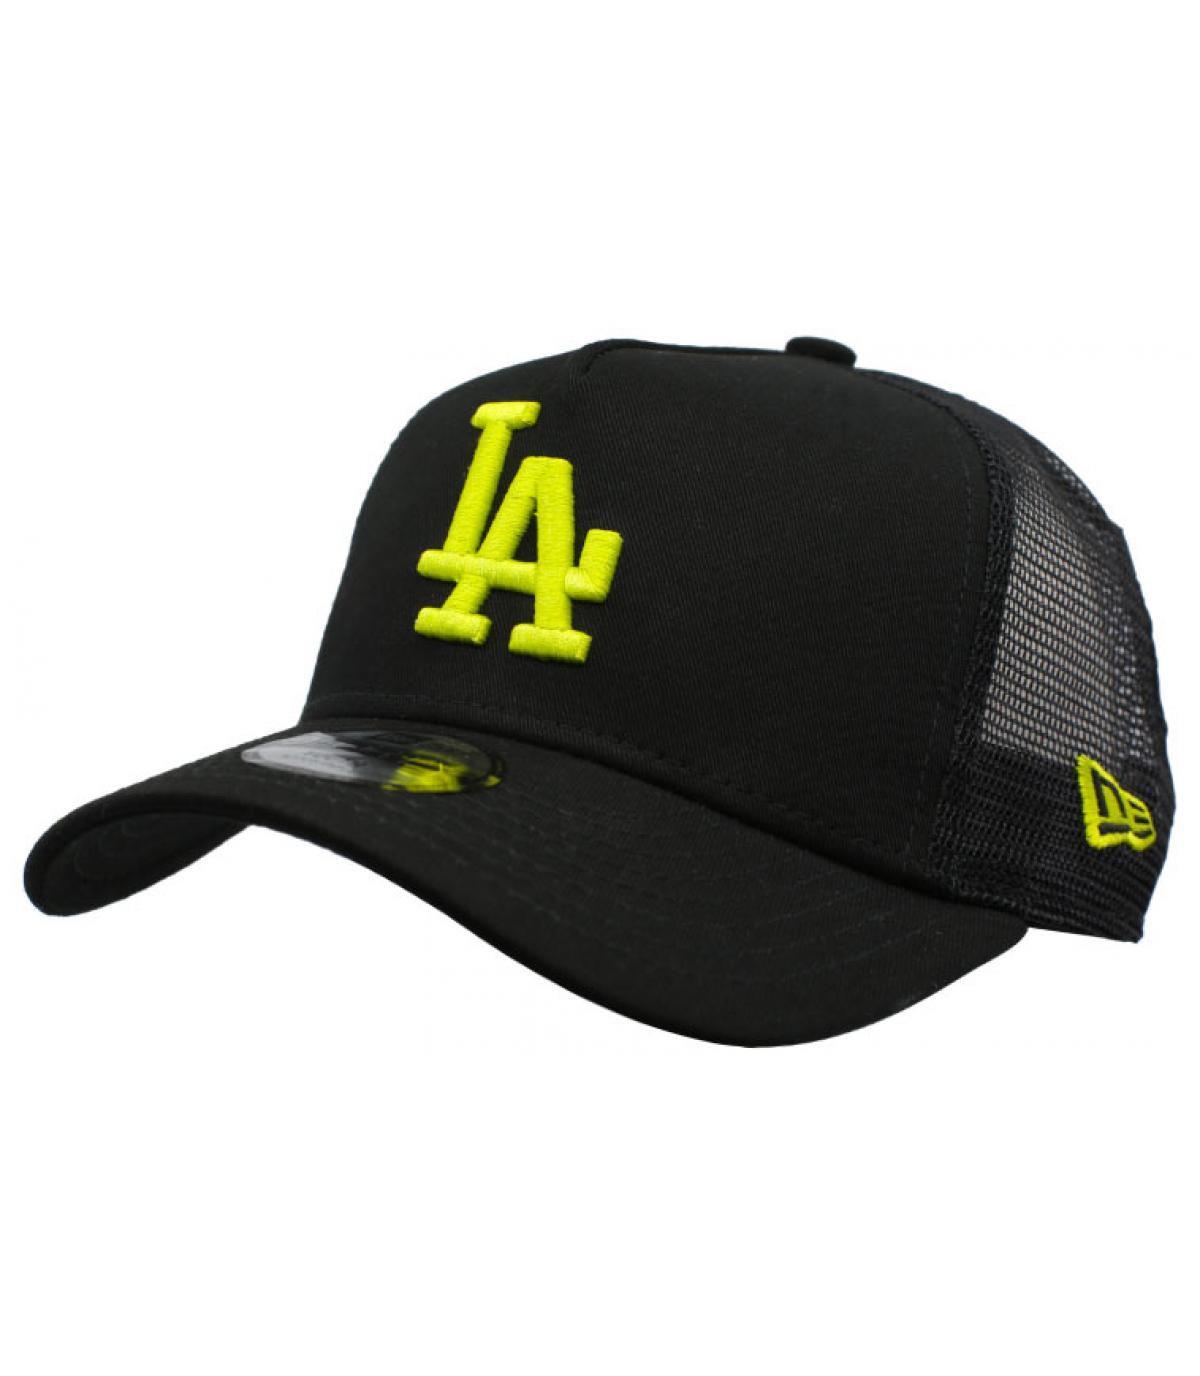 Kinder Trucker LA schwarz gelb